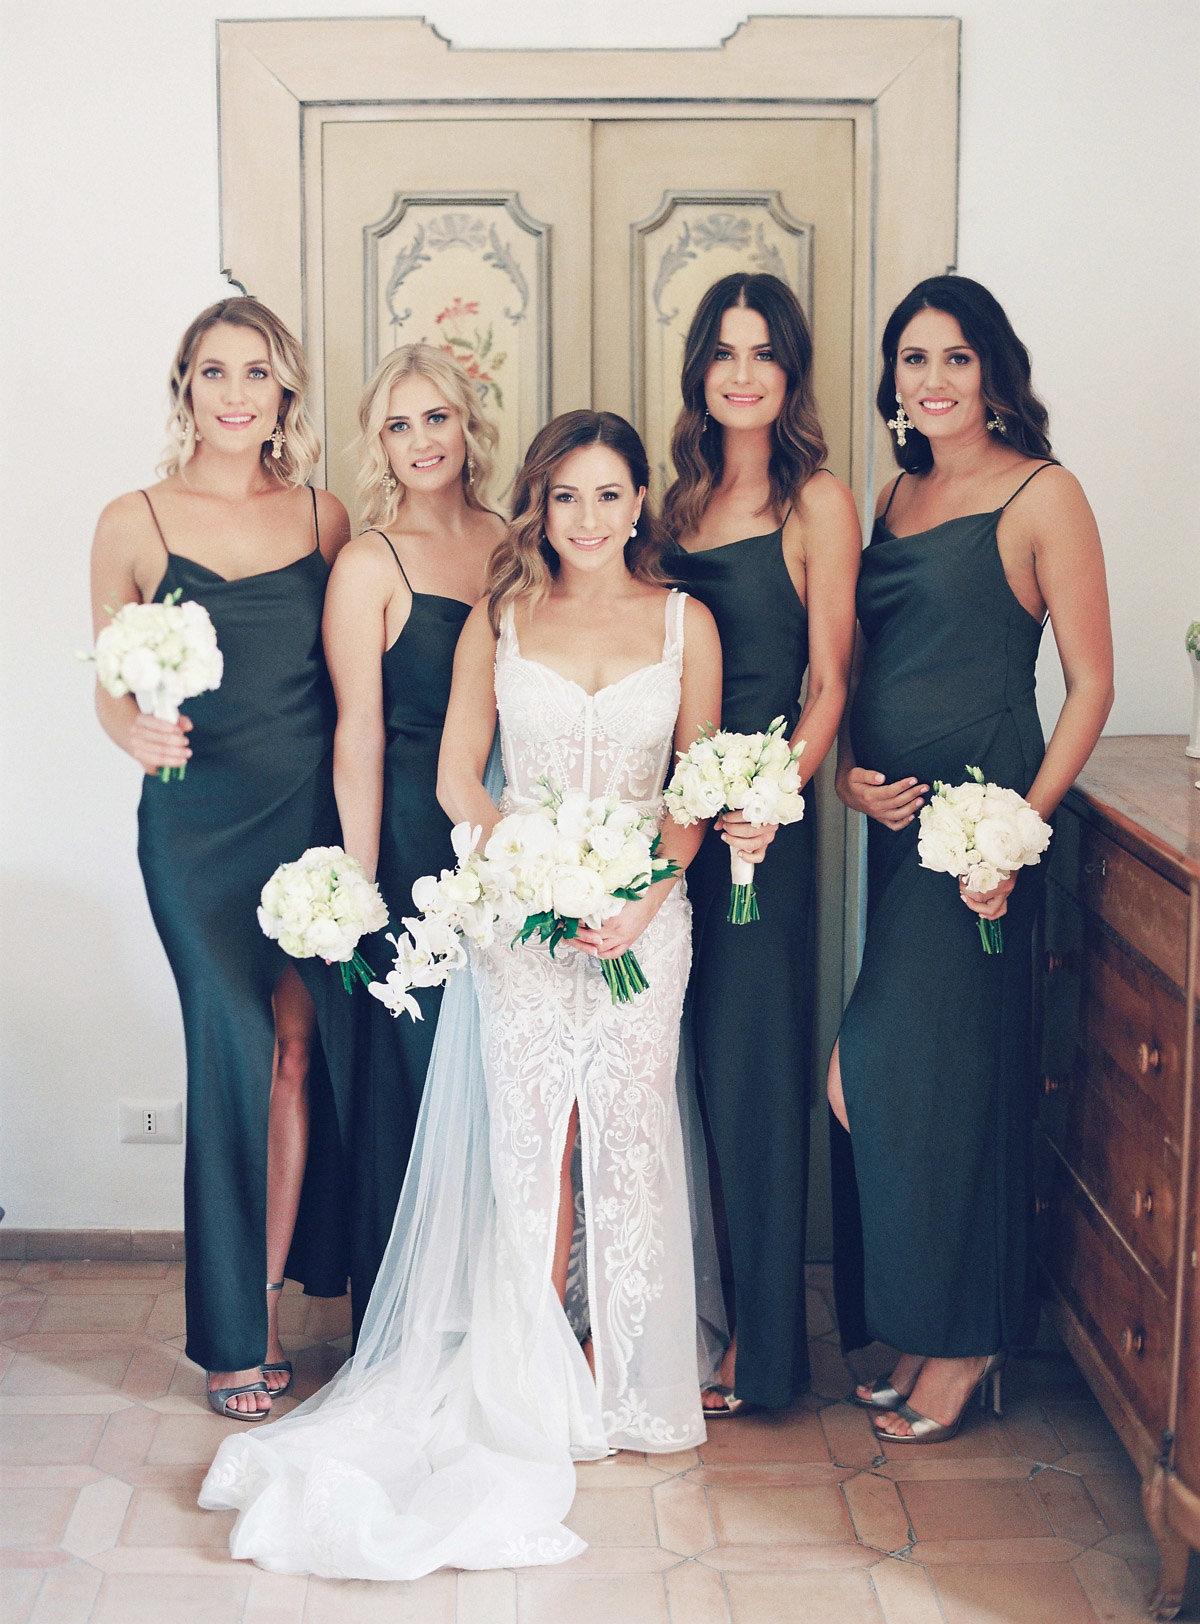 Amy & Bridesmaids // Photo: Katie Grant